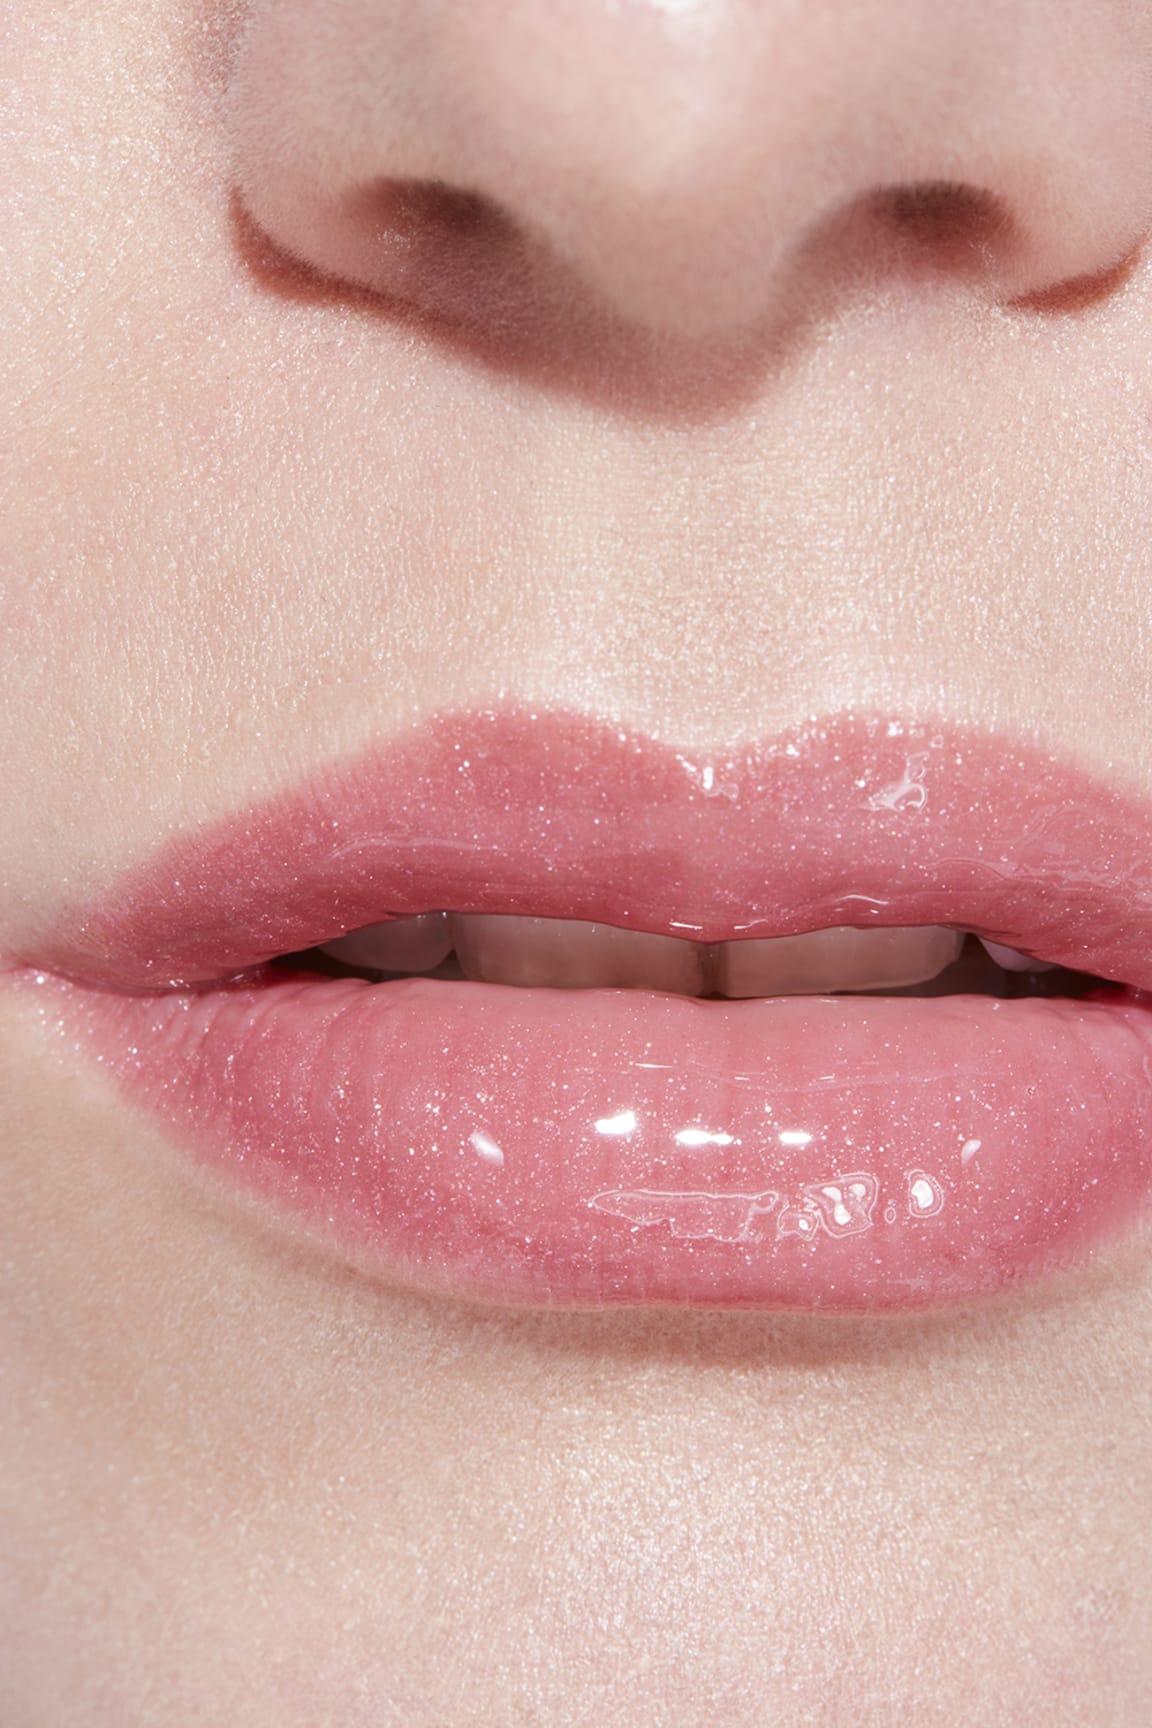 Application makeup visual 3 - ROUGE COCO GLOSS 96 - MAGNOLIA